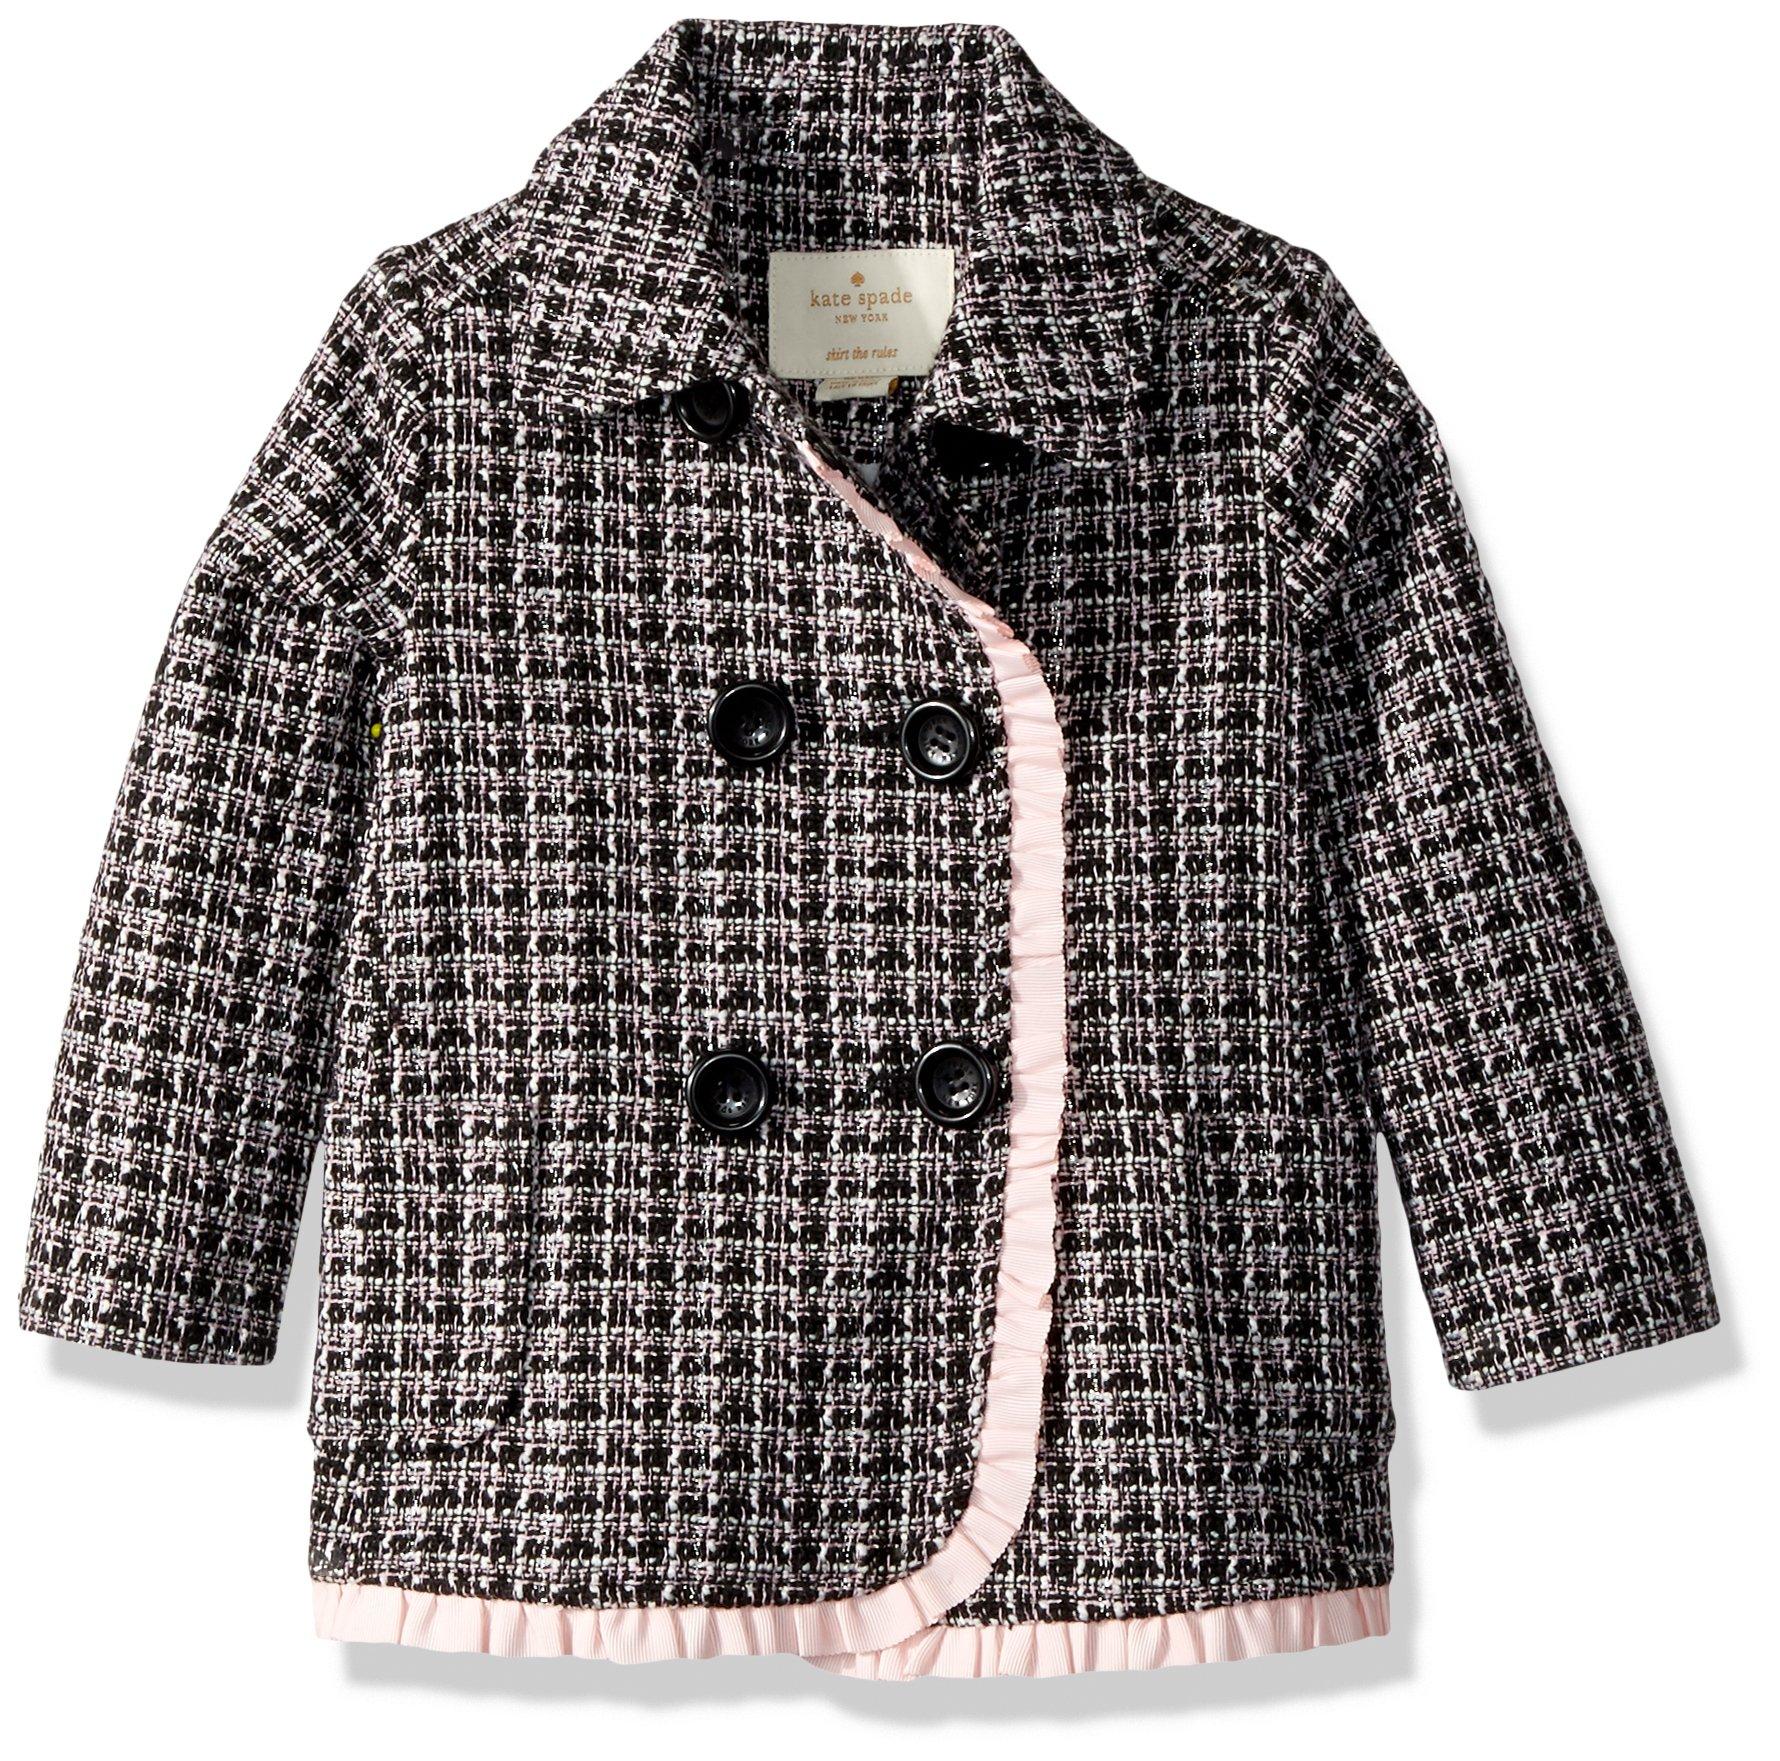 kate spade new york Baby Girls' Tweed Coat, Black/Slipper, 18 Months